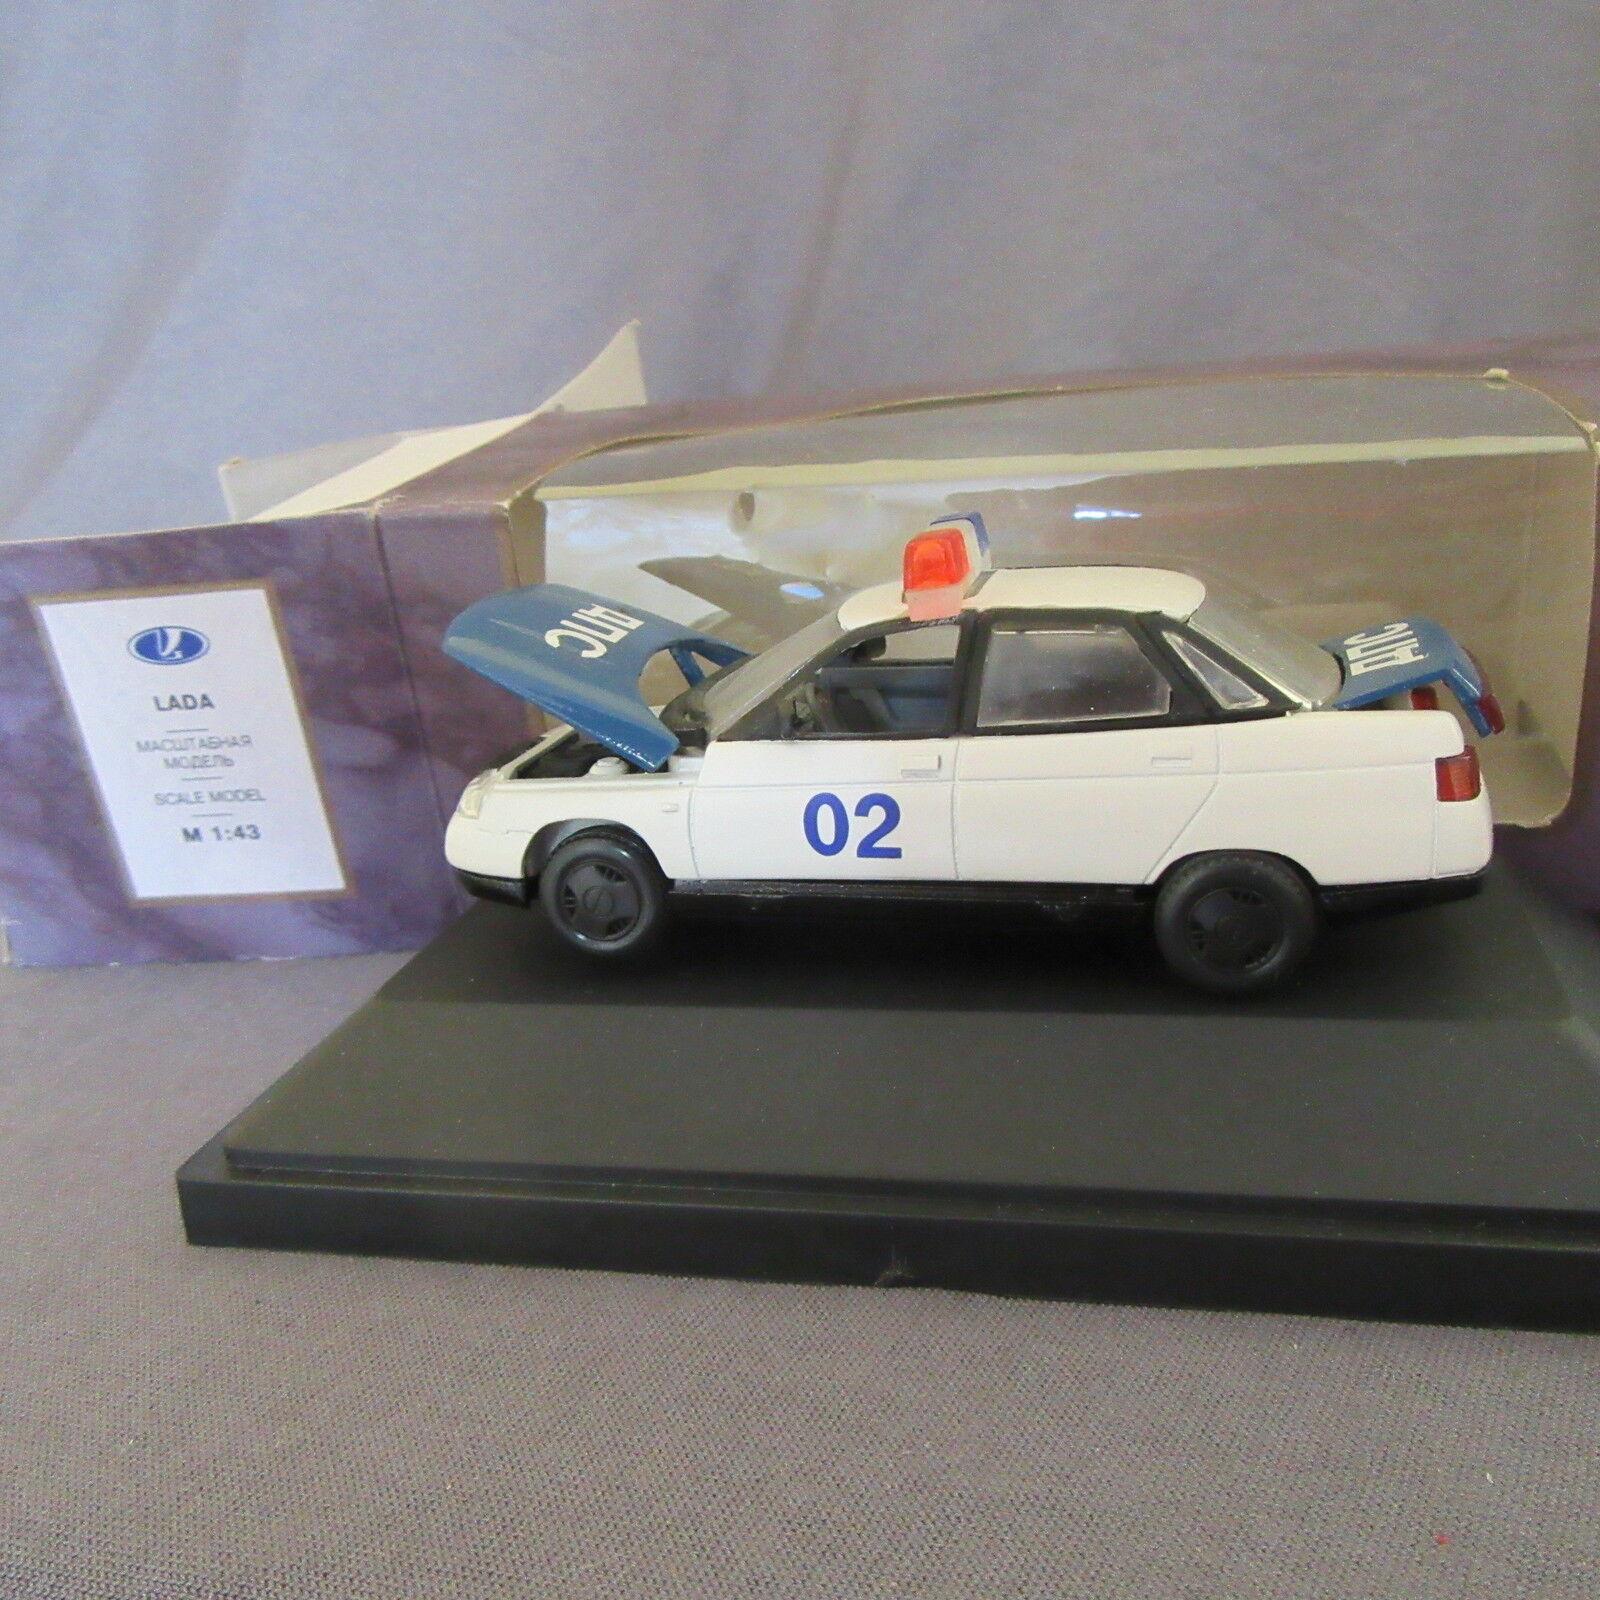 286C Agat Lada 2110 Soviet Police 02 Vaz URSS 1 43